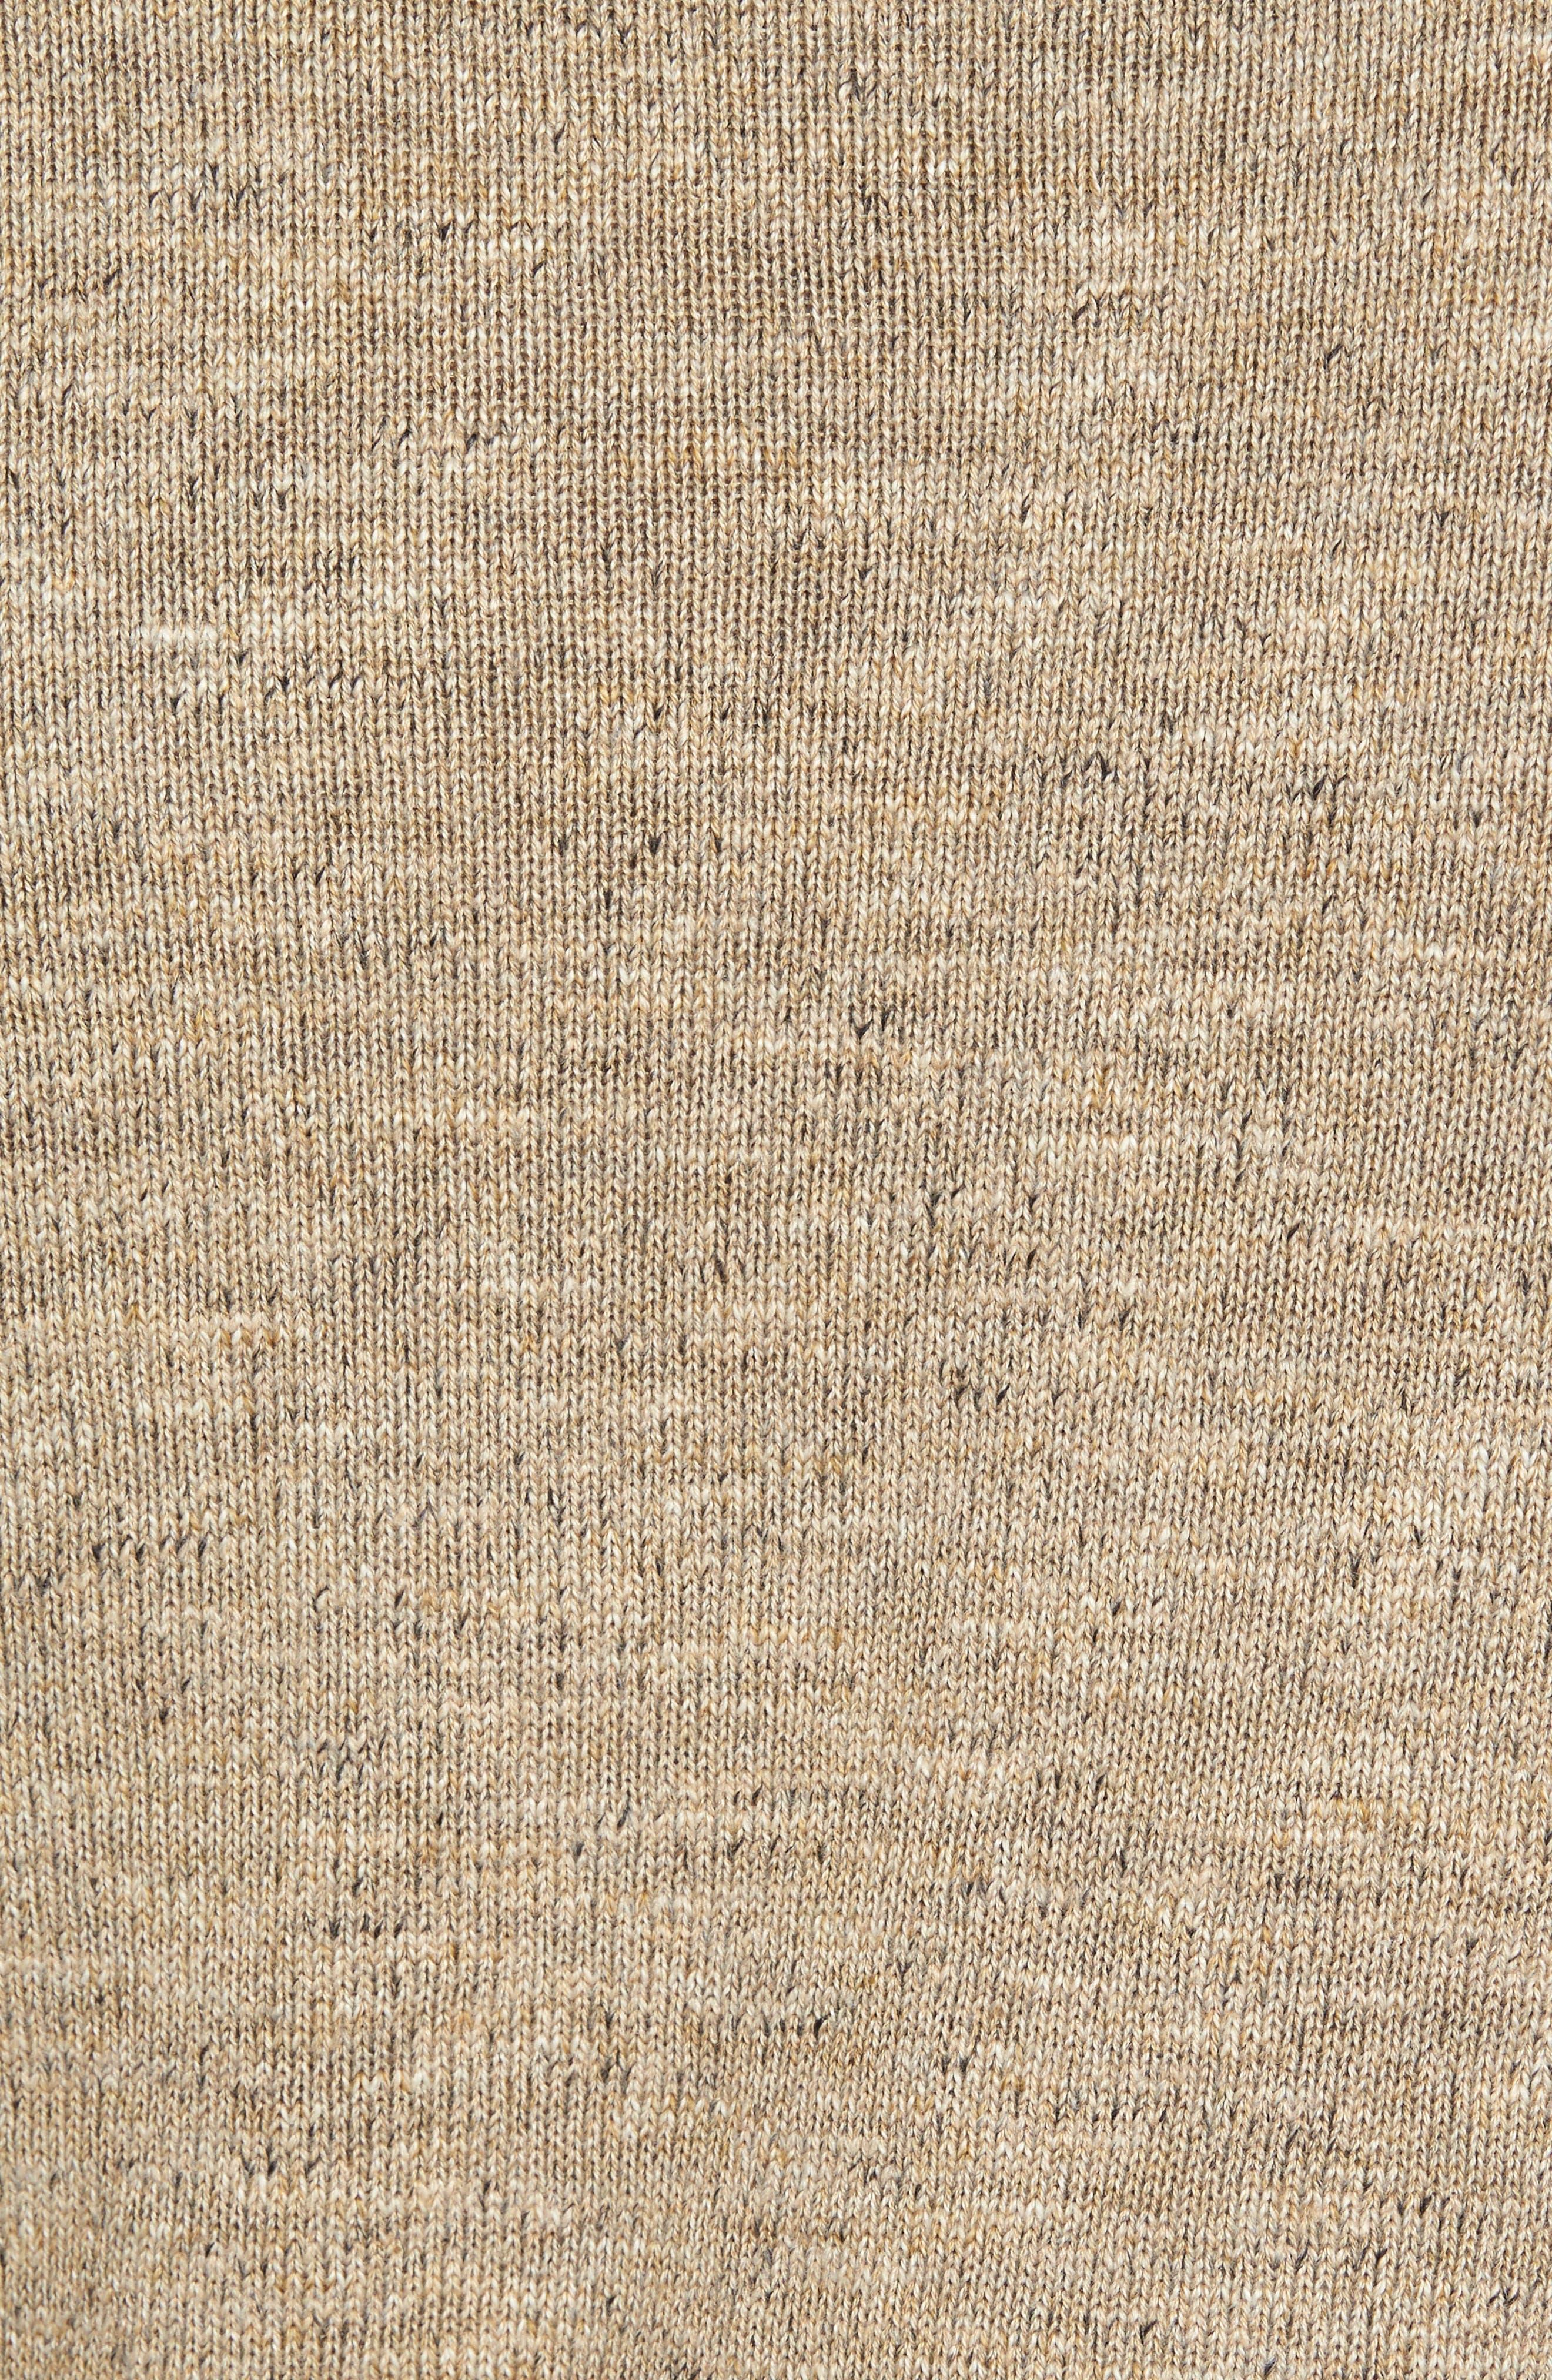 Alternate Image 4  - Tommy Bahama Gran Rey Flip Reversible Cotton & Wool Sweater